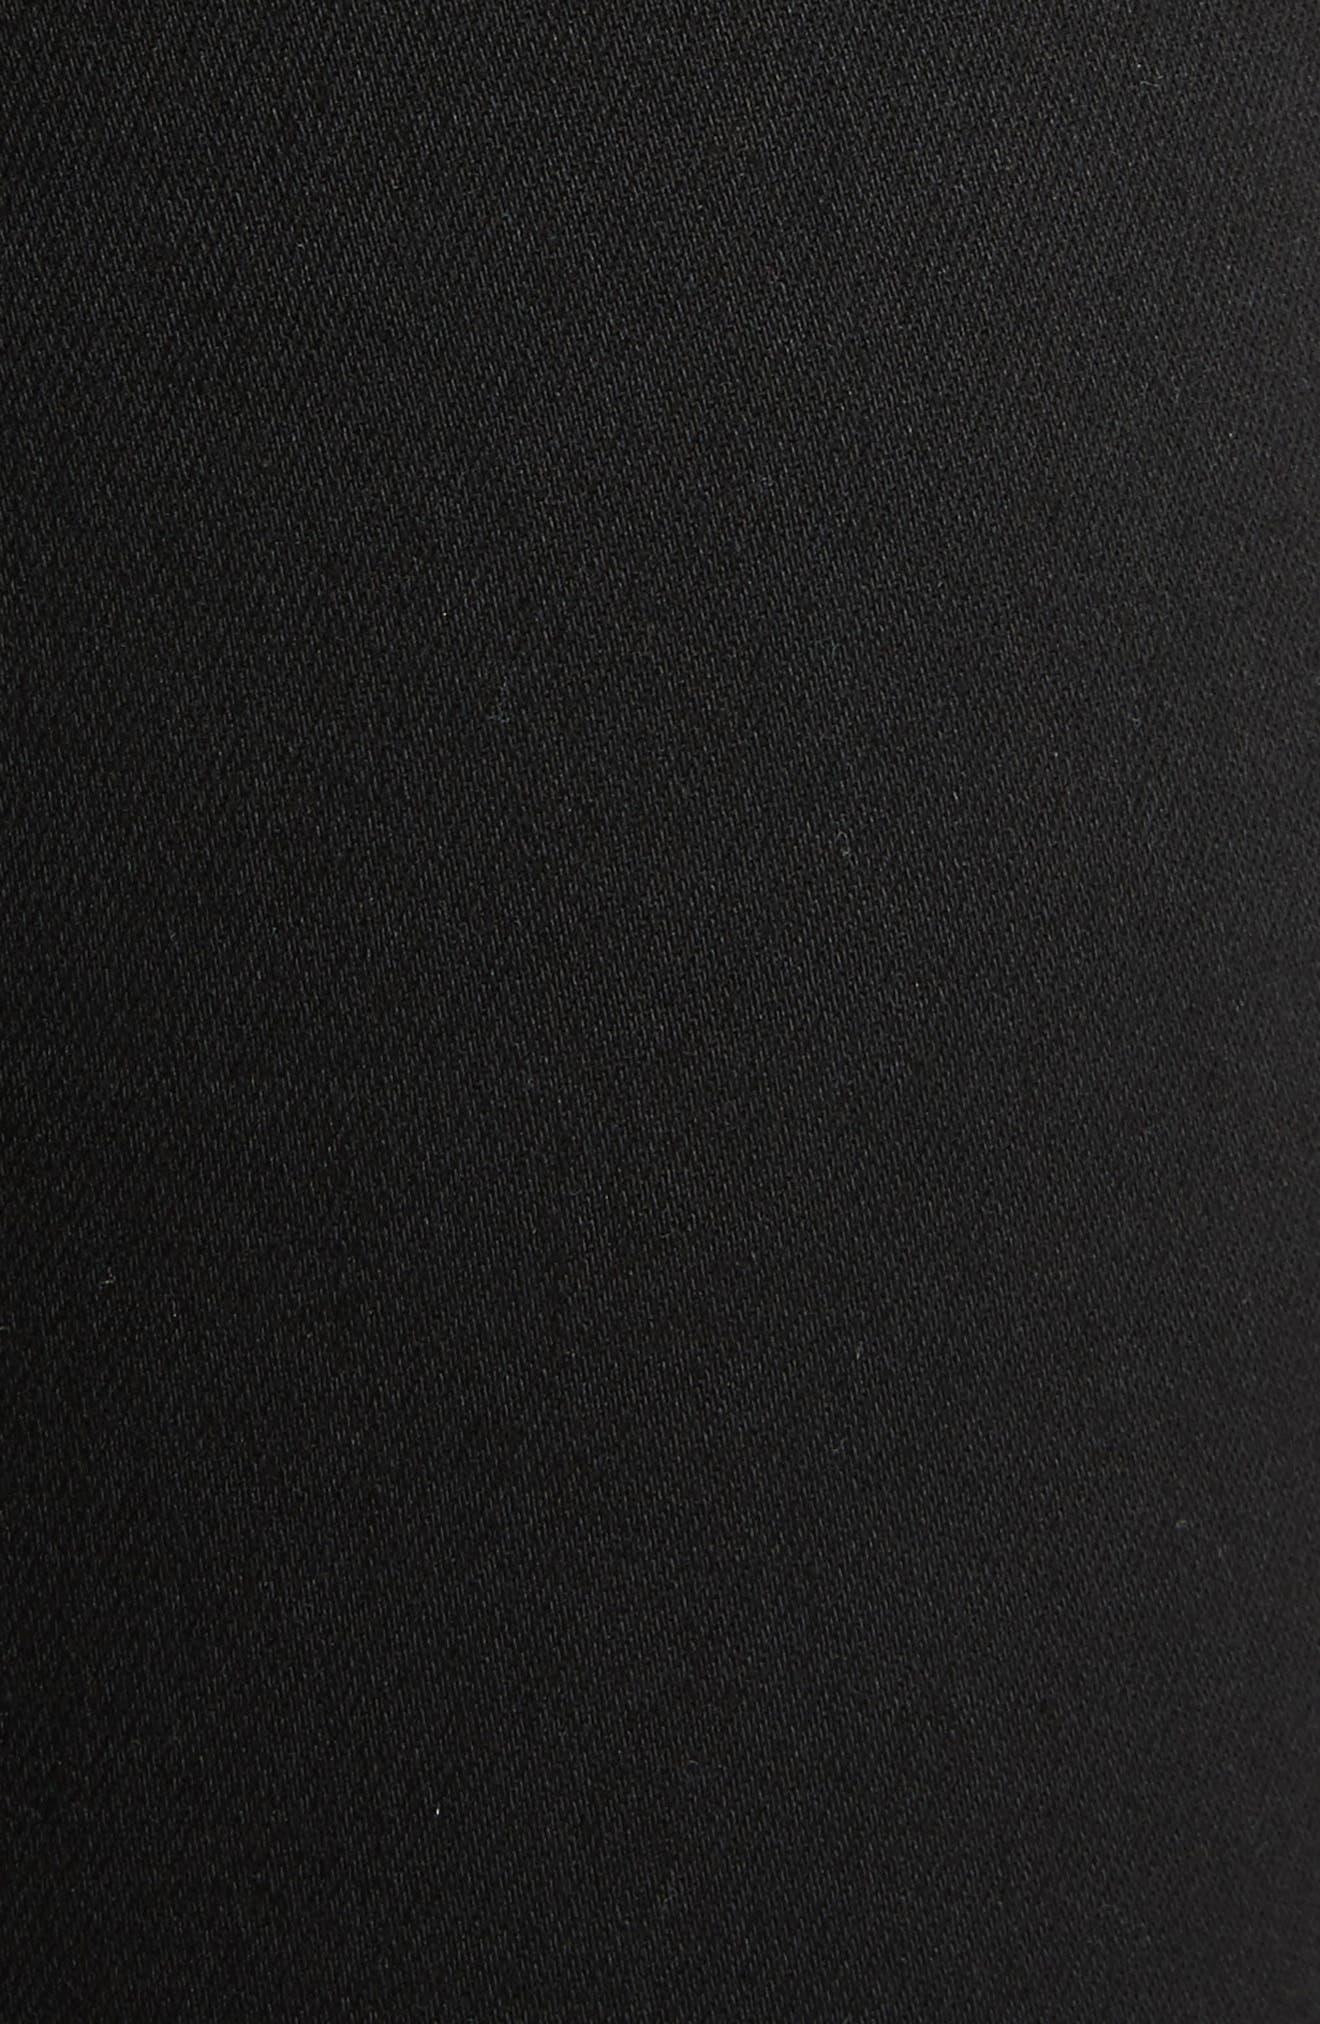 Isabel High Waist Skinny Jeans,                             Alternate thumbnail 6, color,                             Black